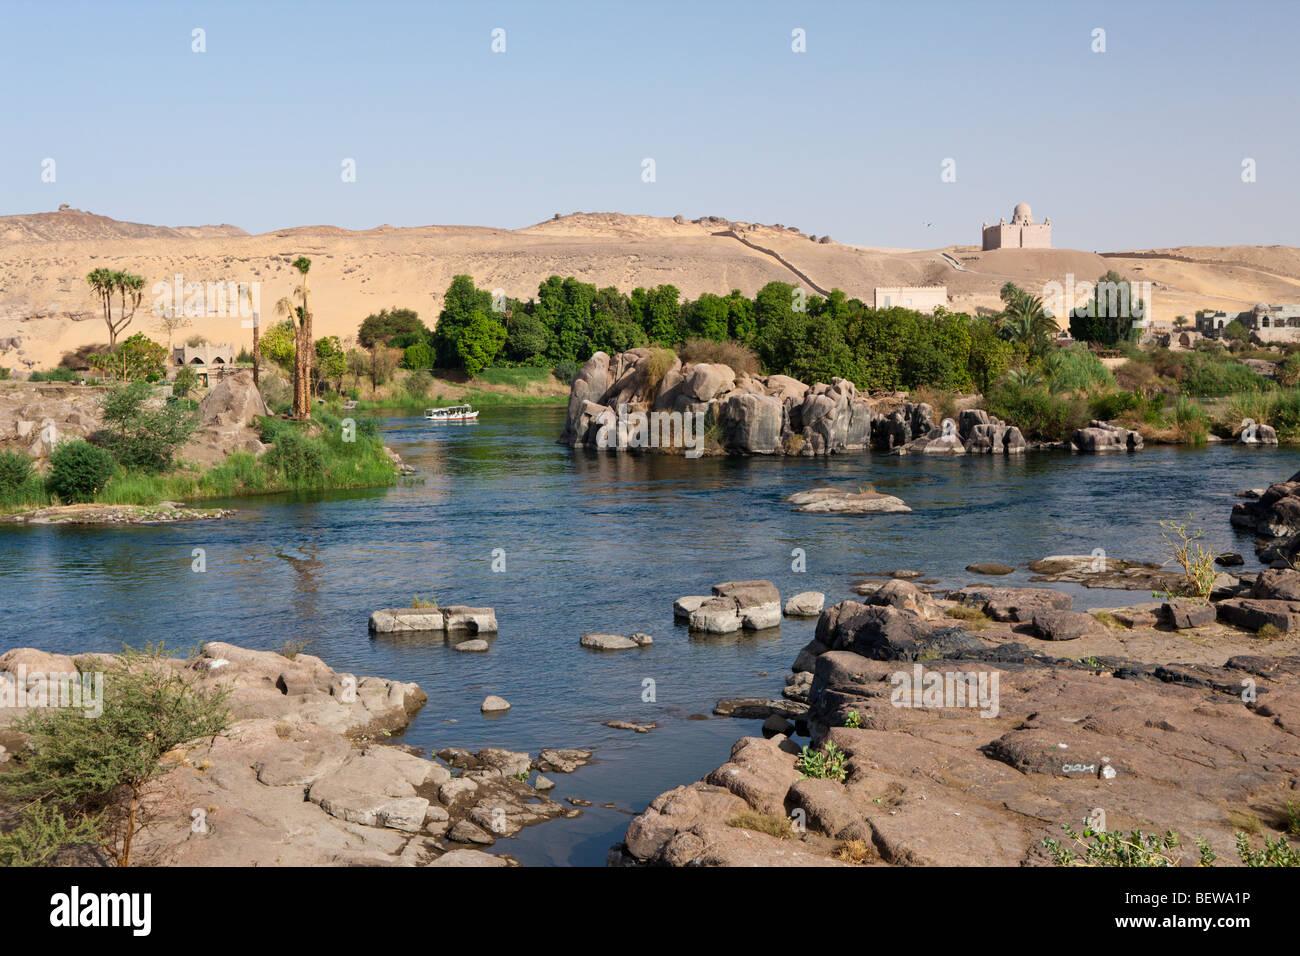 Nile River Cataract Aswan Egypt Stock Photo 26372242 Alamy